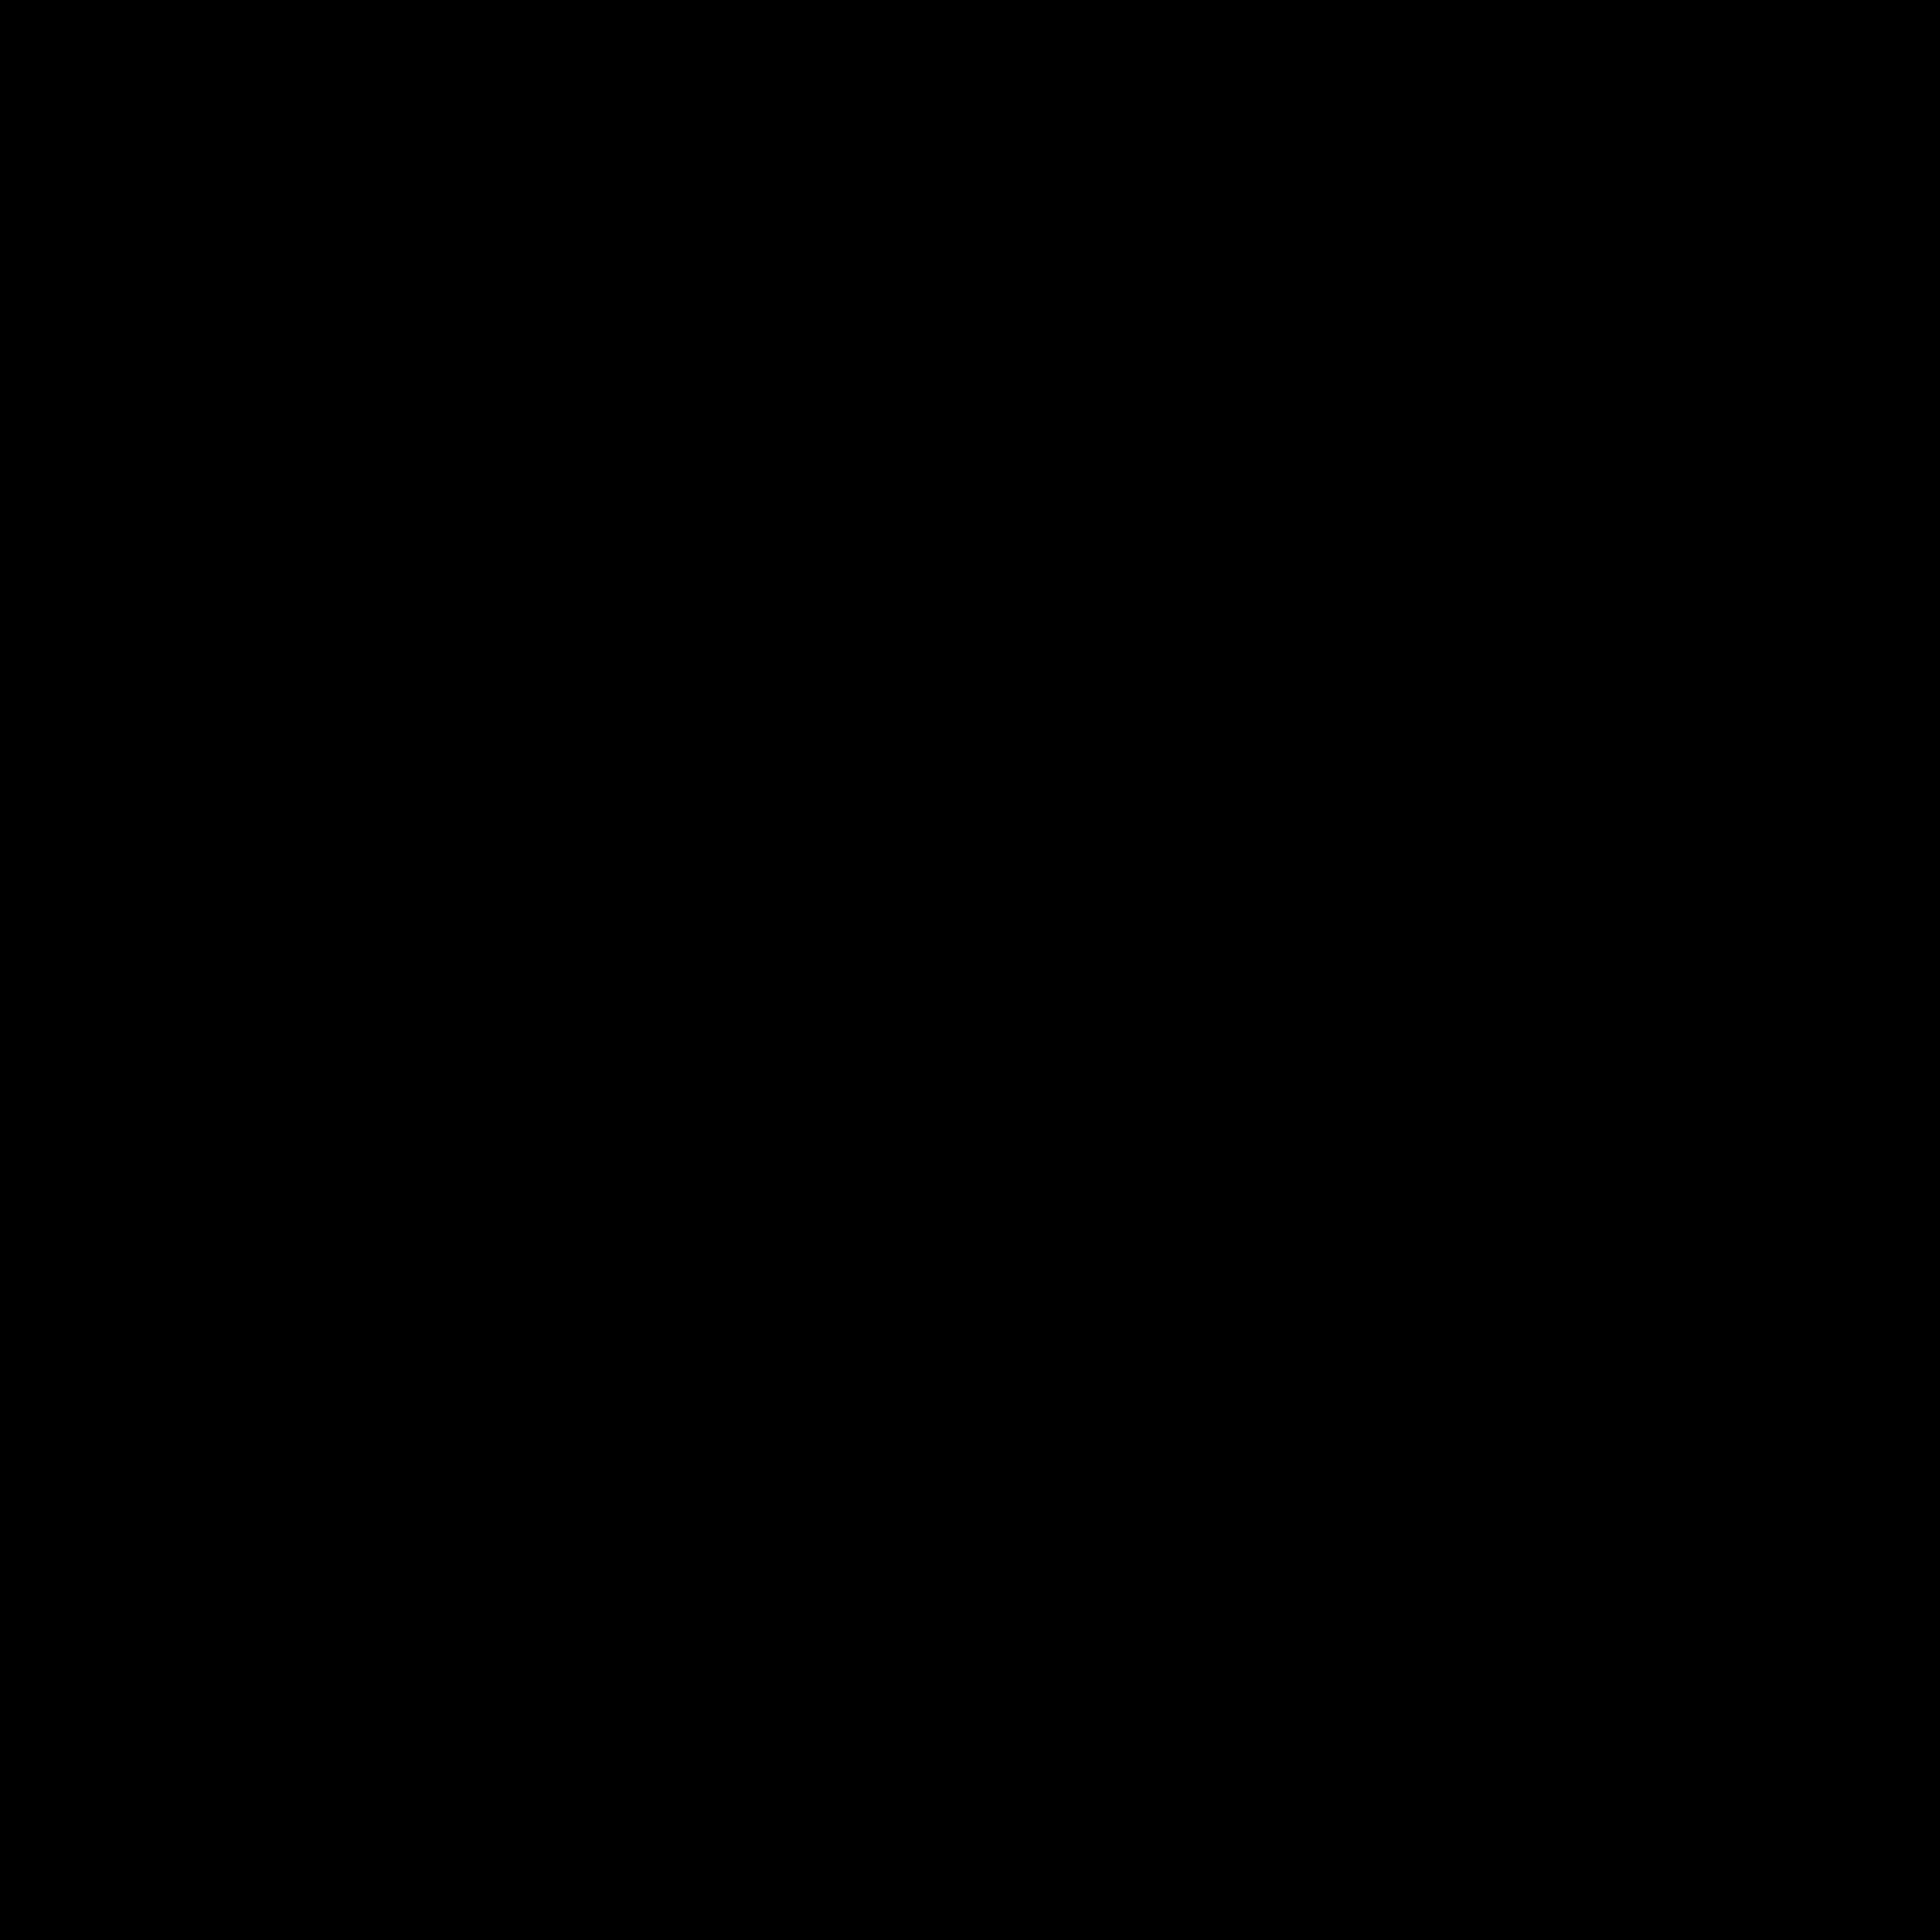 girl praying drawing at getdrawings com free for personal use girl rh getdrawings com family praying clipart black and white praying mantis clipart black and white